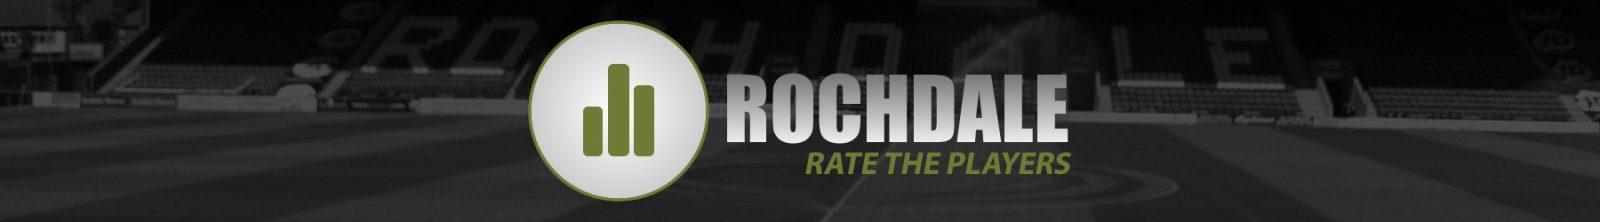 Rate Rochdale